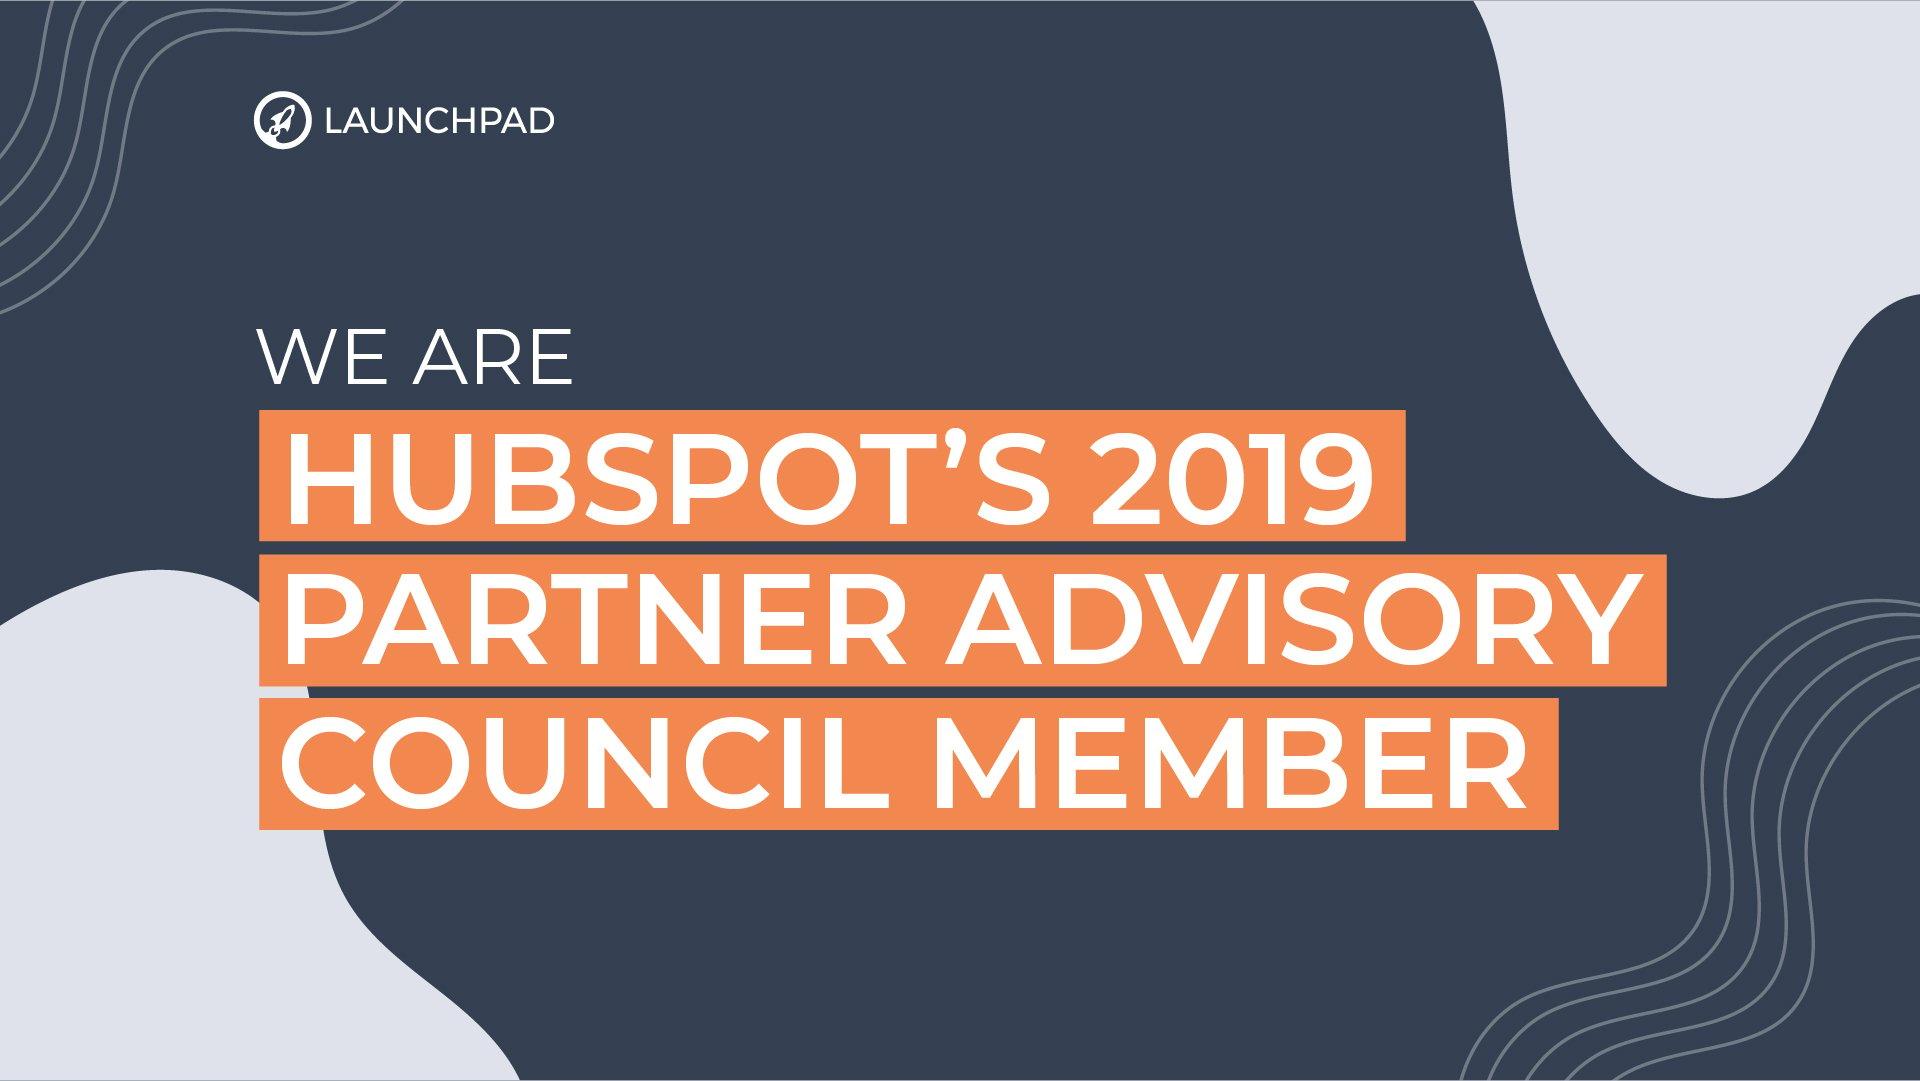 We are HubSpots 2019 Partner Advisory Council member